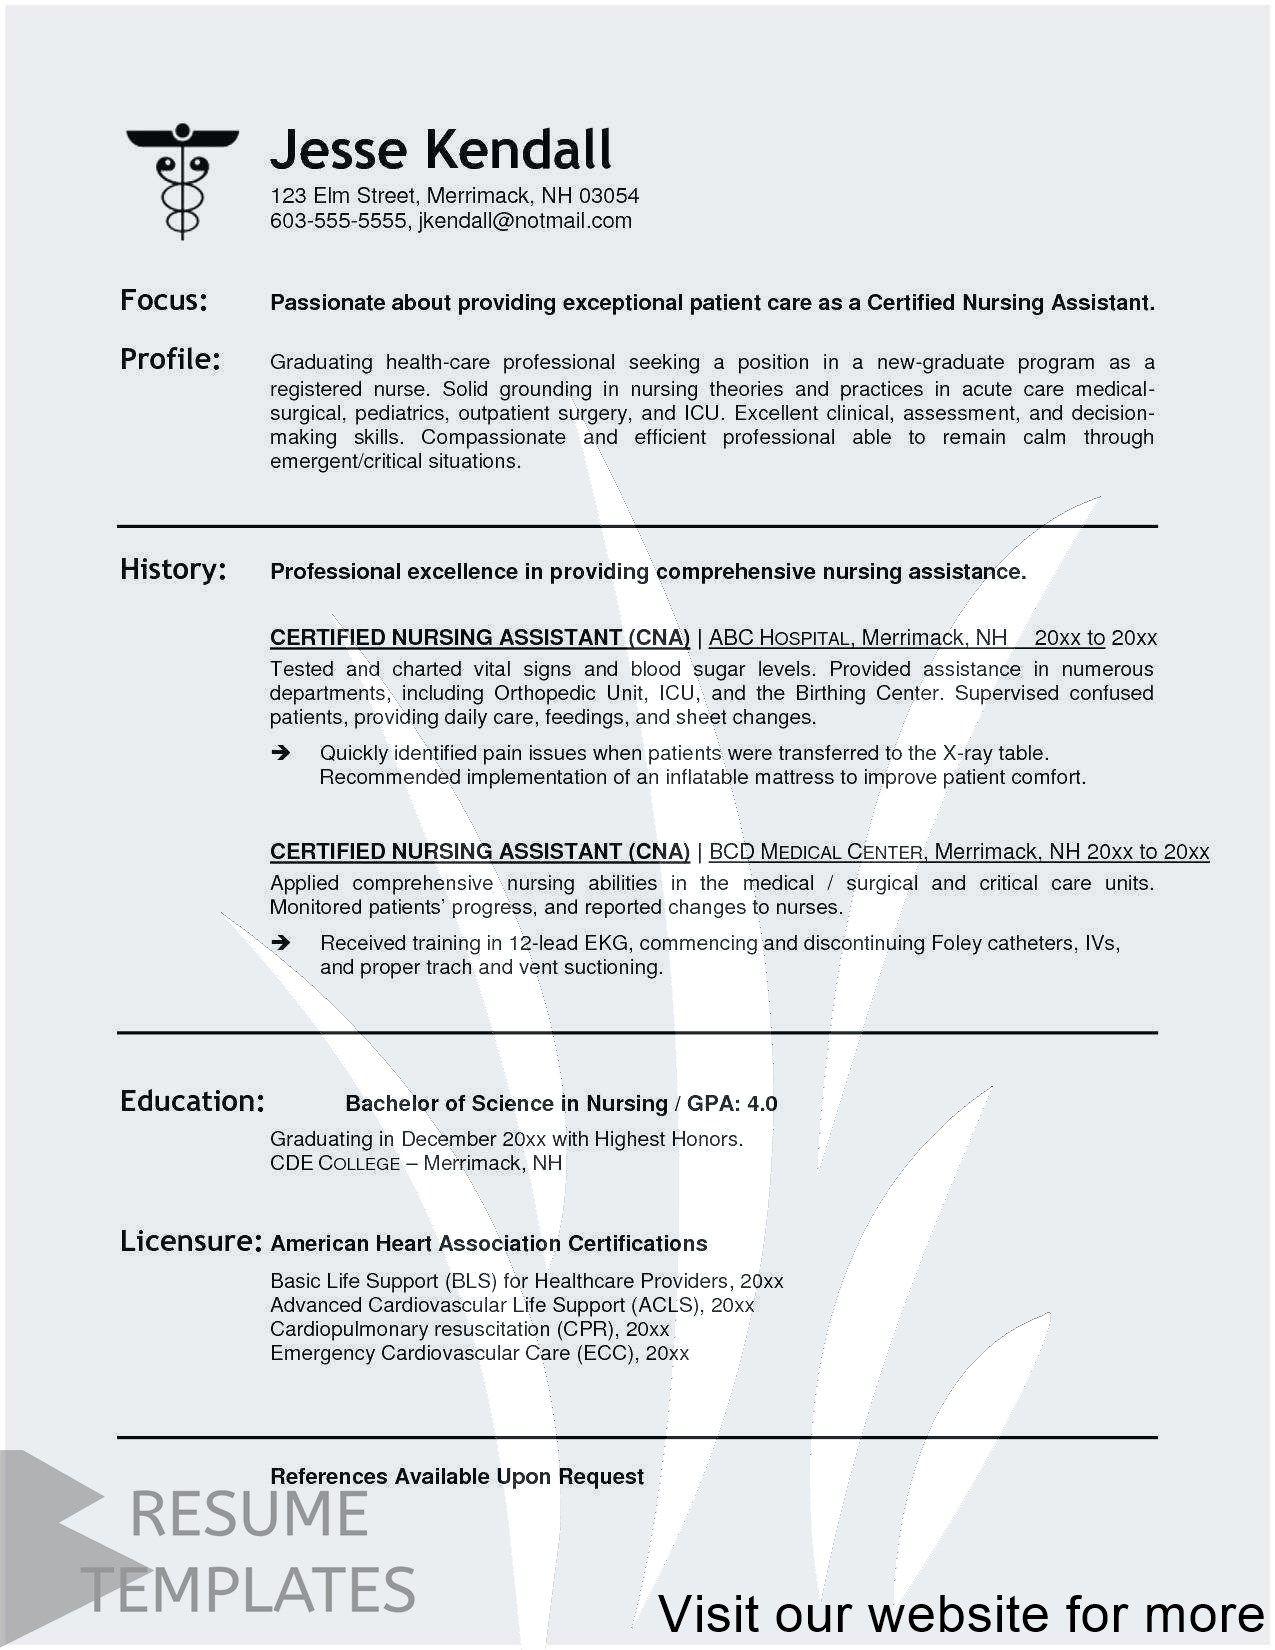 resume template academic 2020 in 2020 Resume template